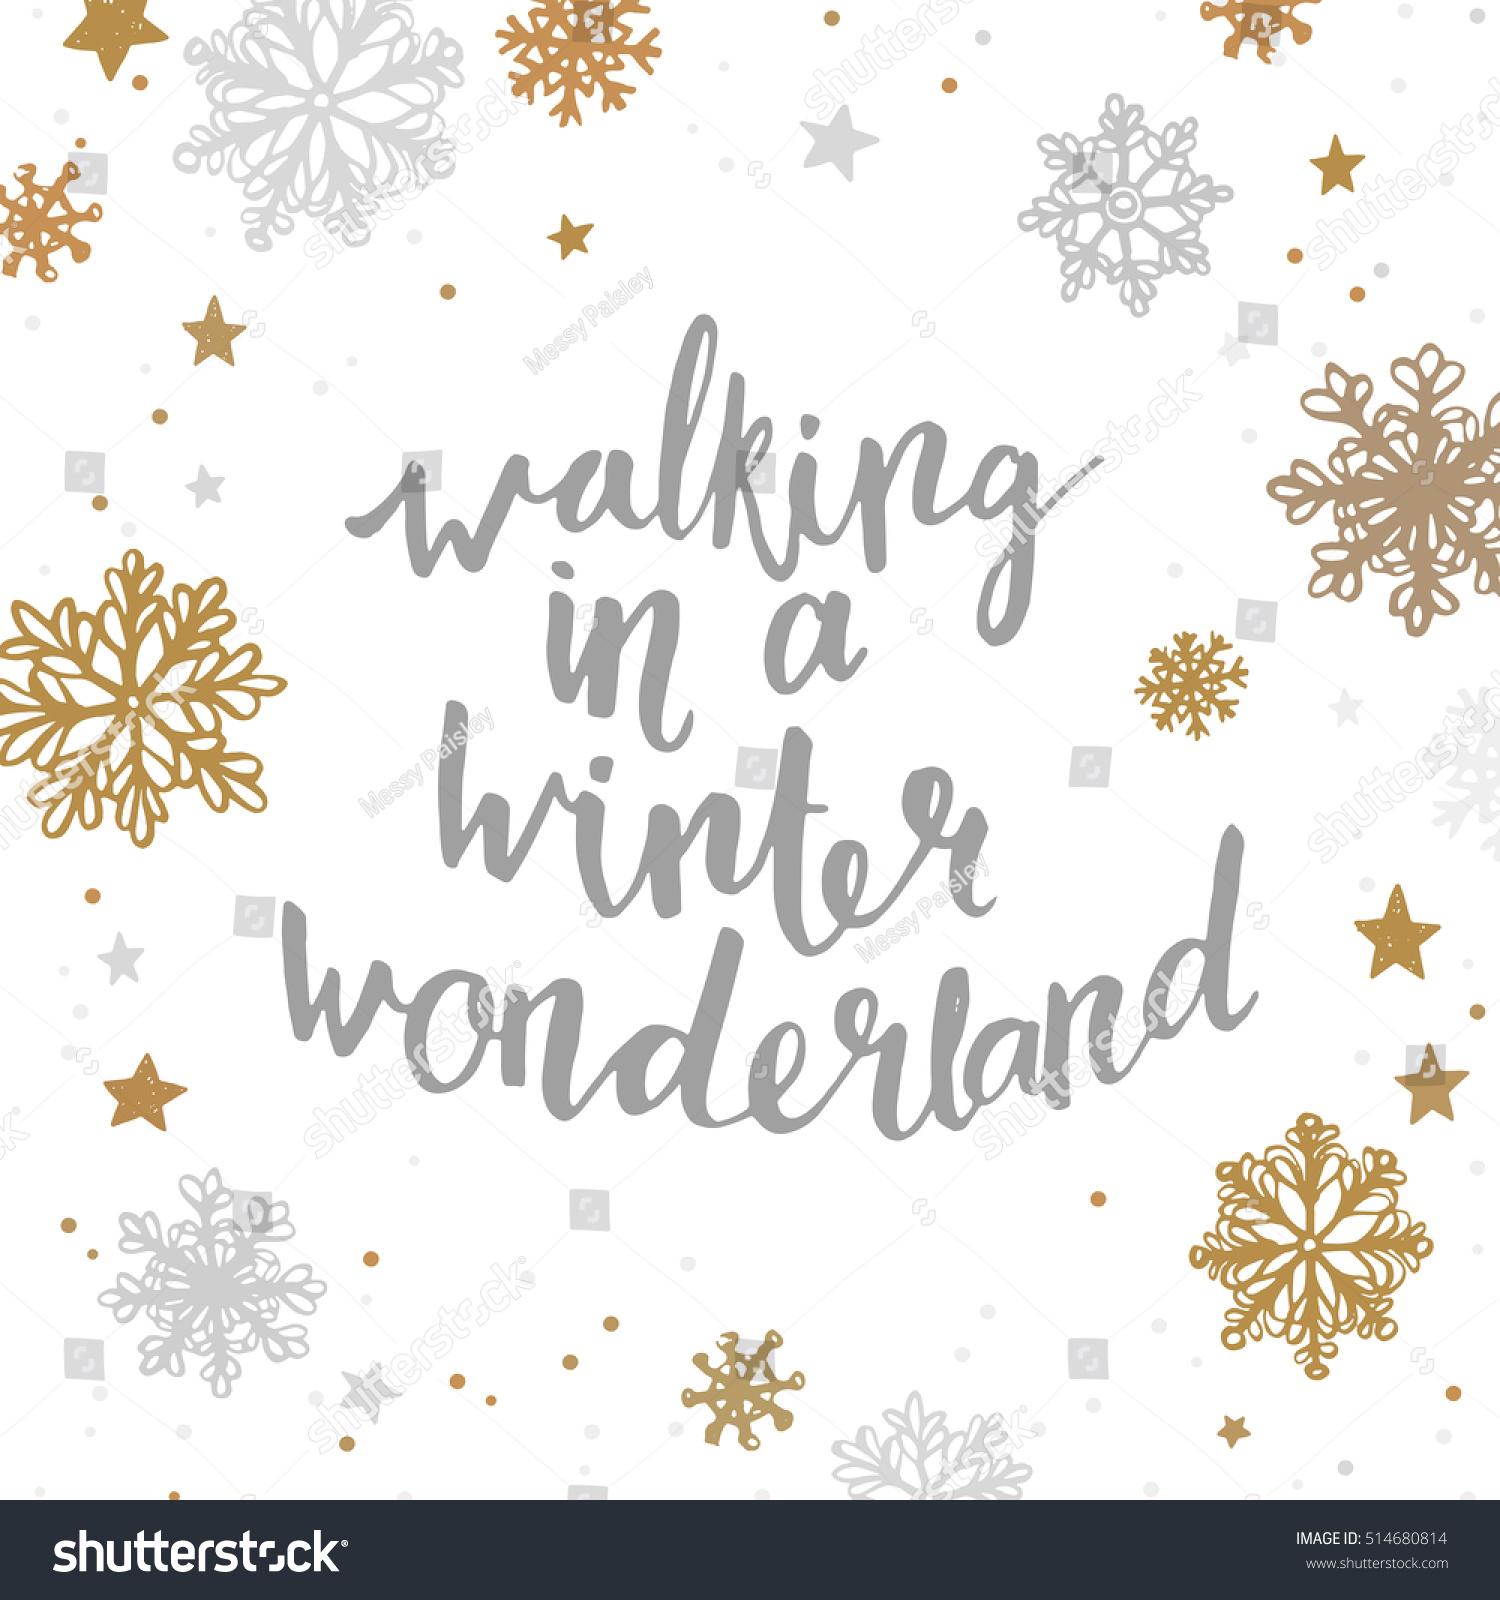 walking winter wonderland quote about winter stock vector 514680814